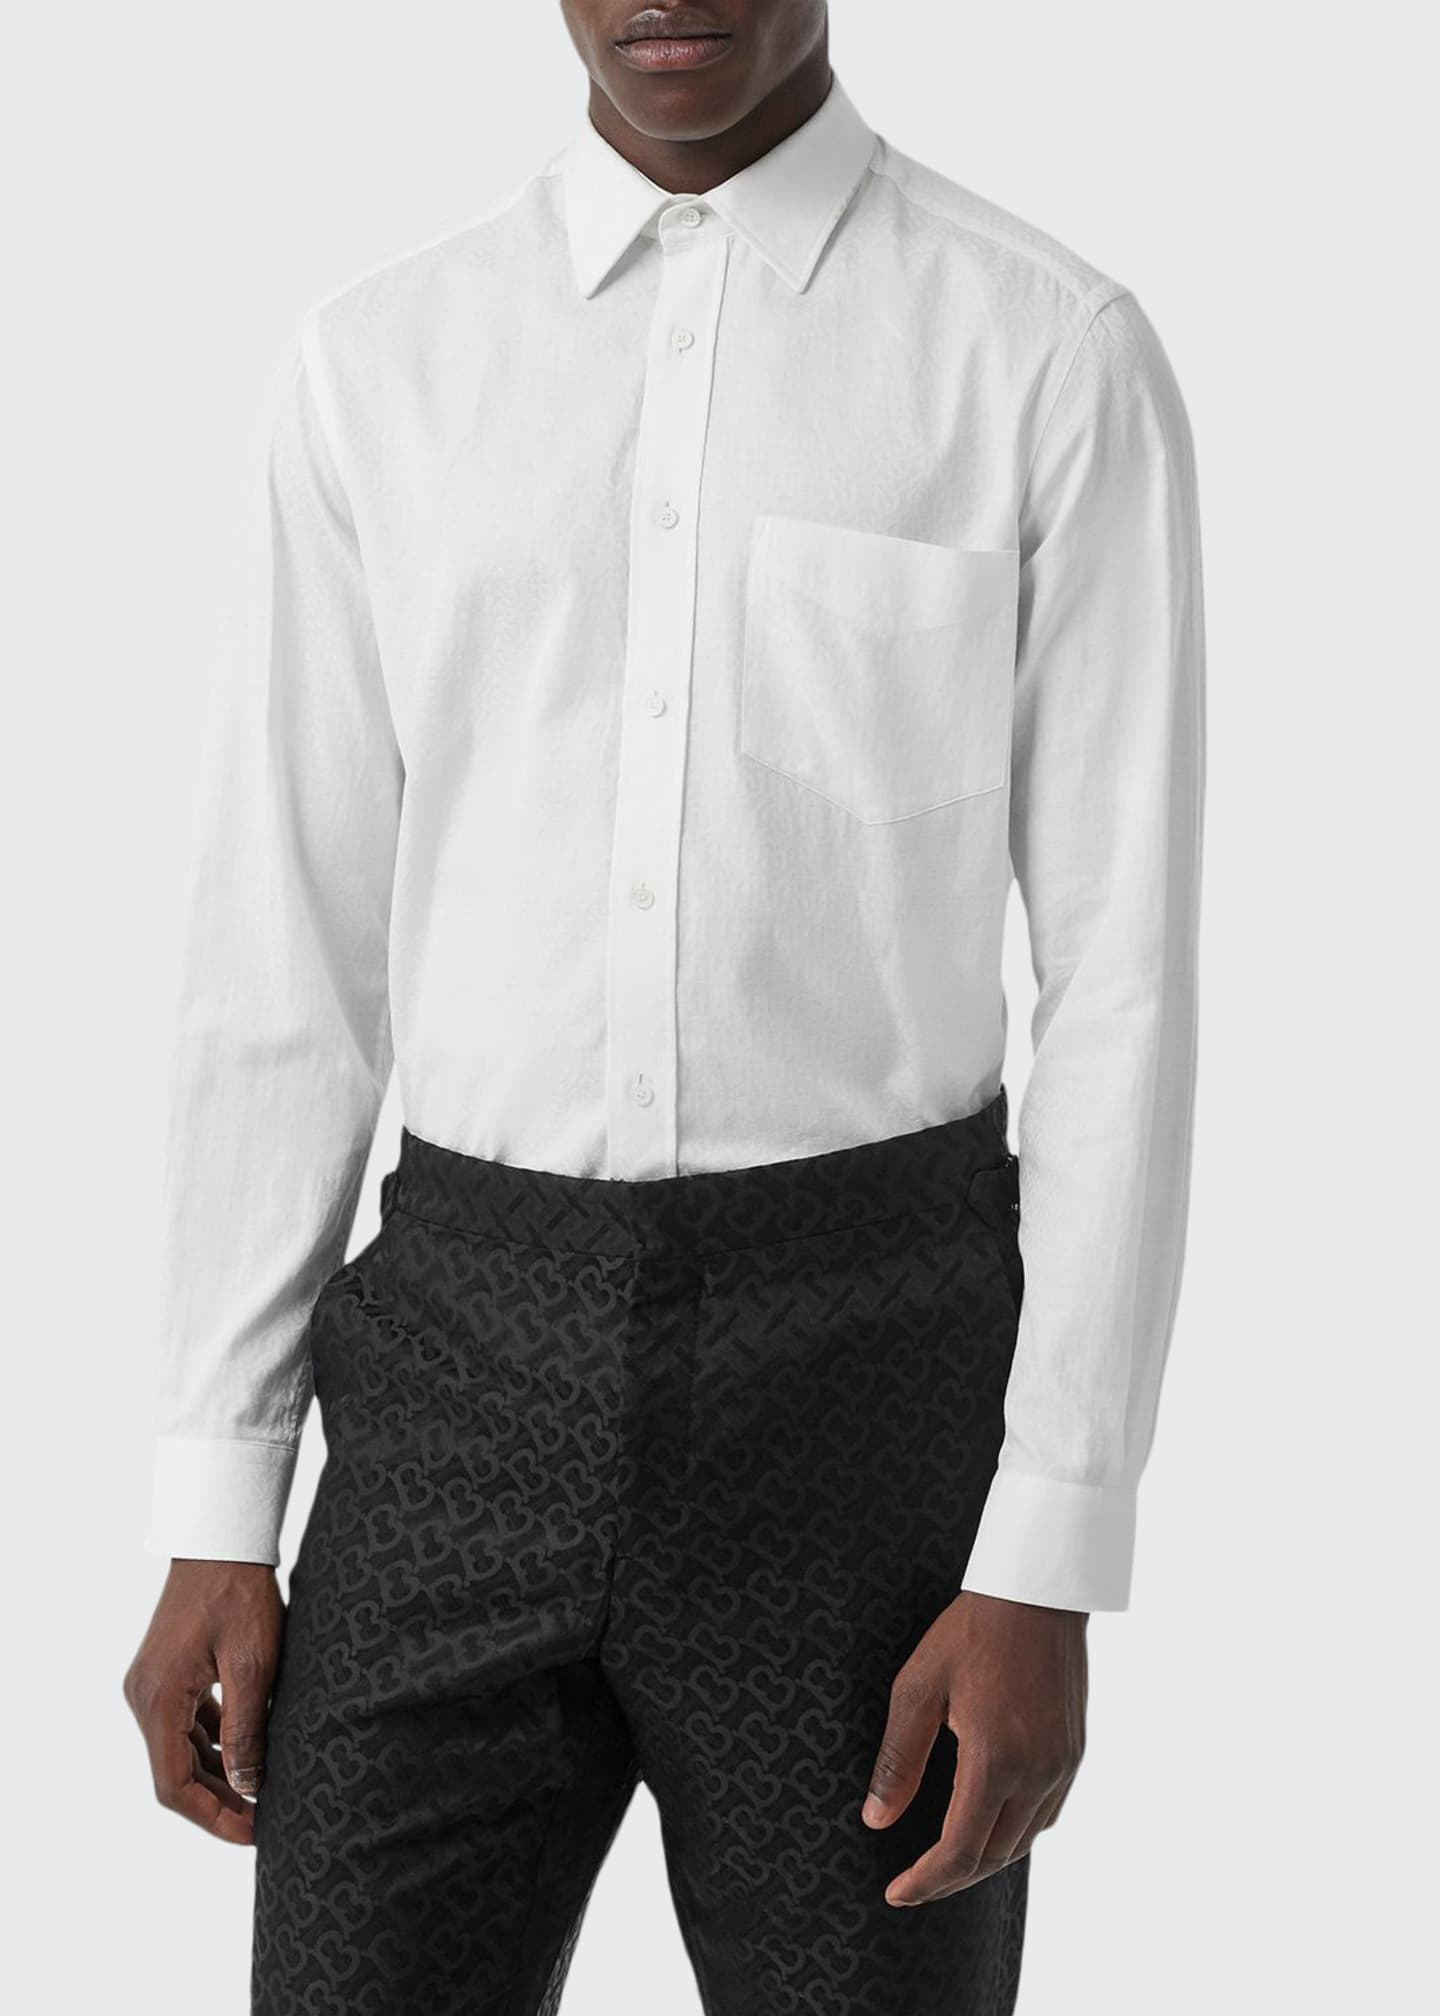 Burberry Men's Textured Solid Sport Shirt